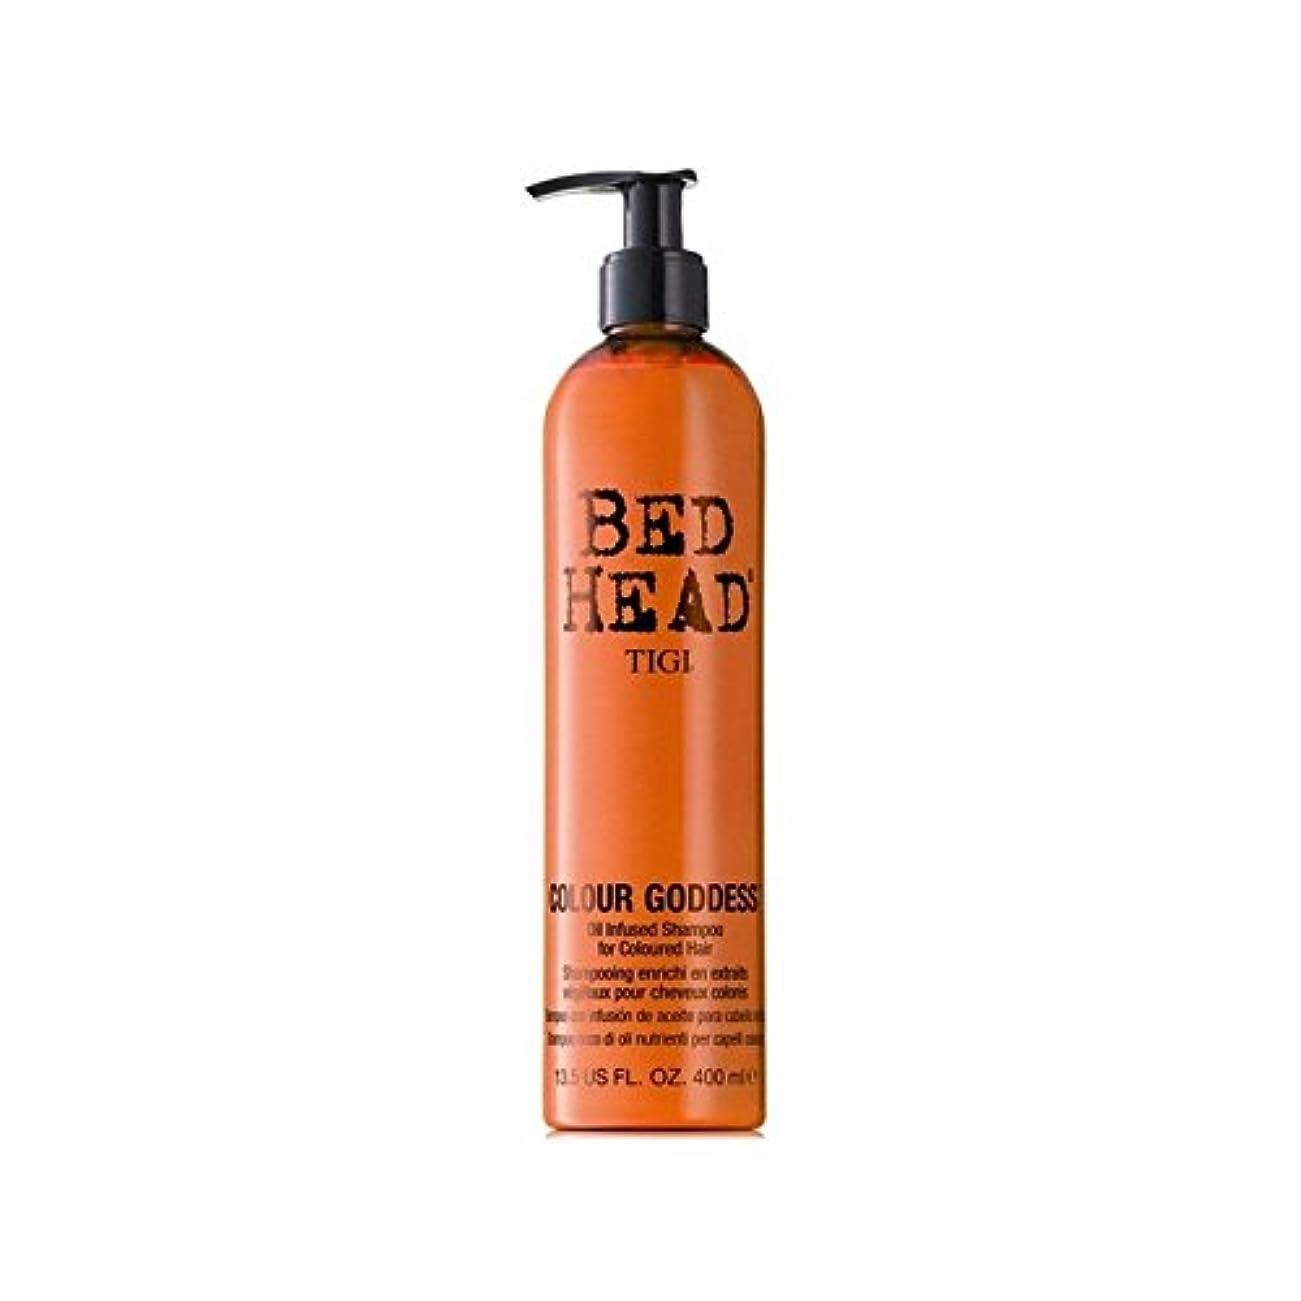 Tigi Bed Head Colour Goddess Shampoo (400ml) - ティジーベッドヘッドカラー女神シャンプー(400ミリリットル) [並行輸入品]